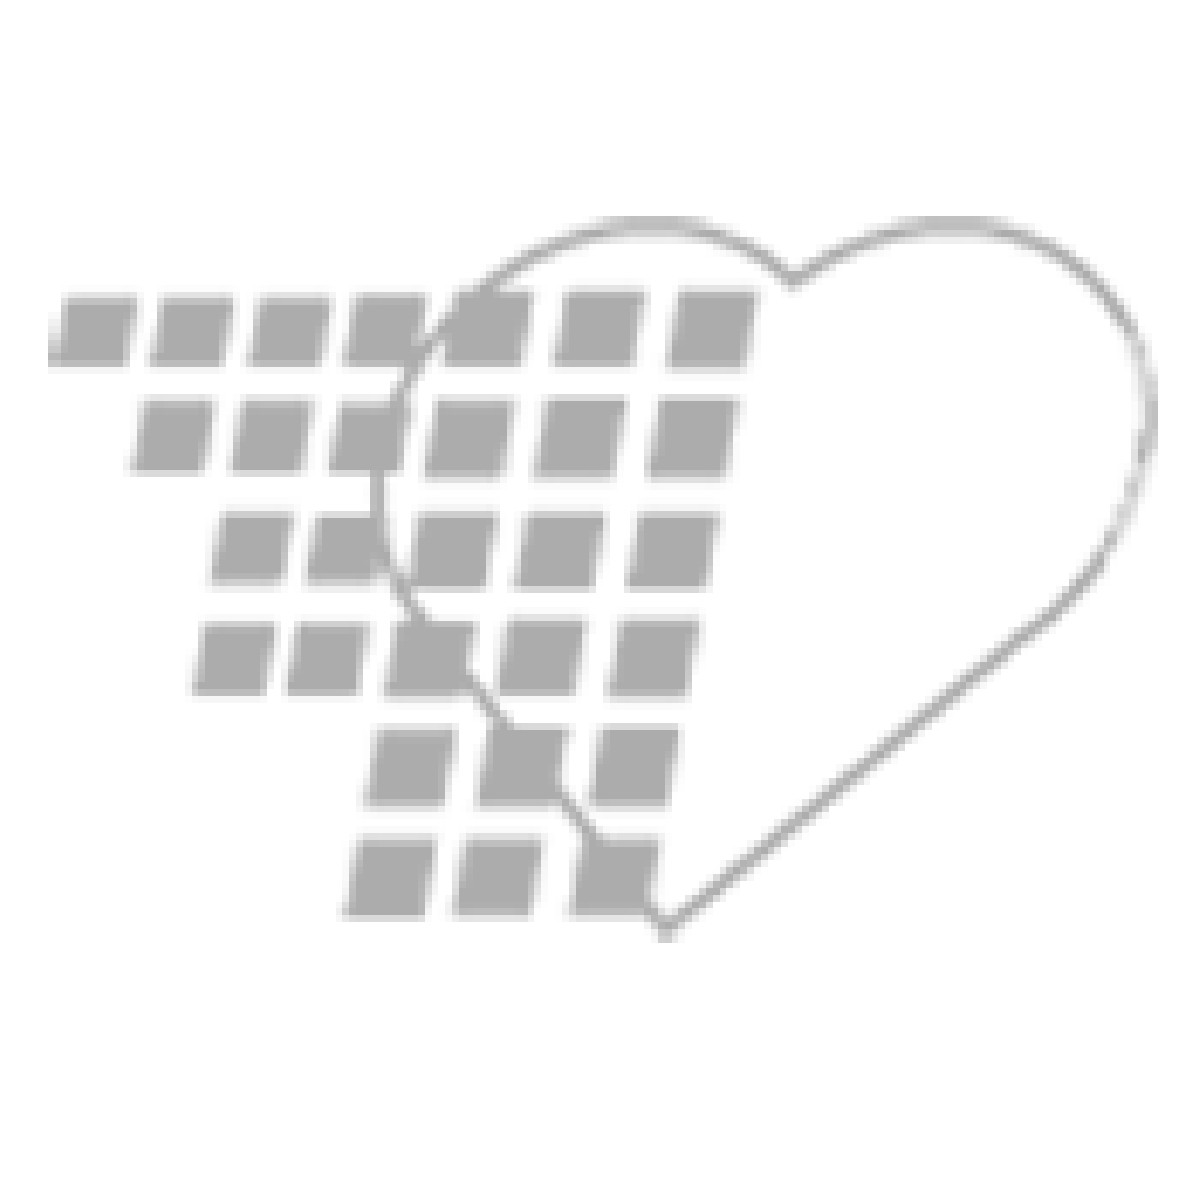 06-93-9011 - Demo Dose® LORazepm (Ativn) 1mL 2mg/mL